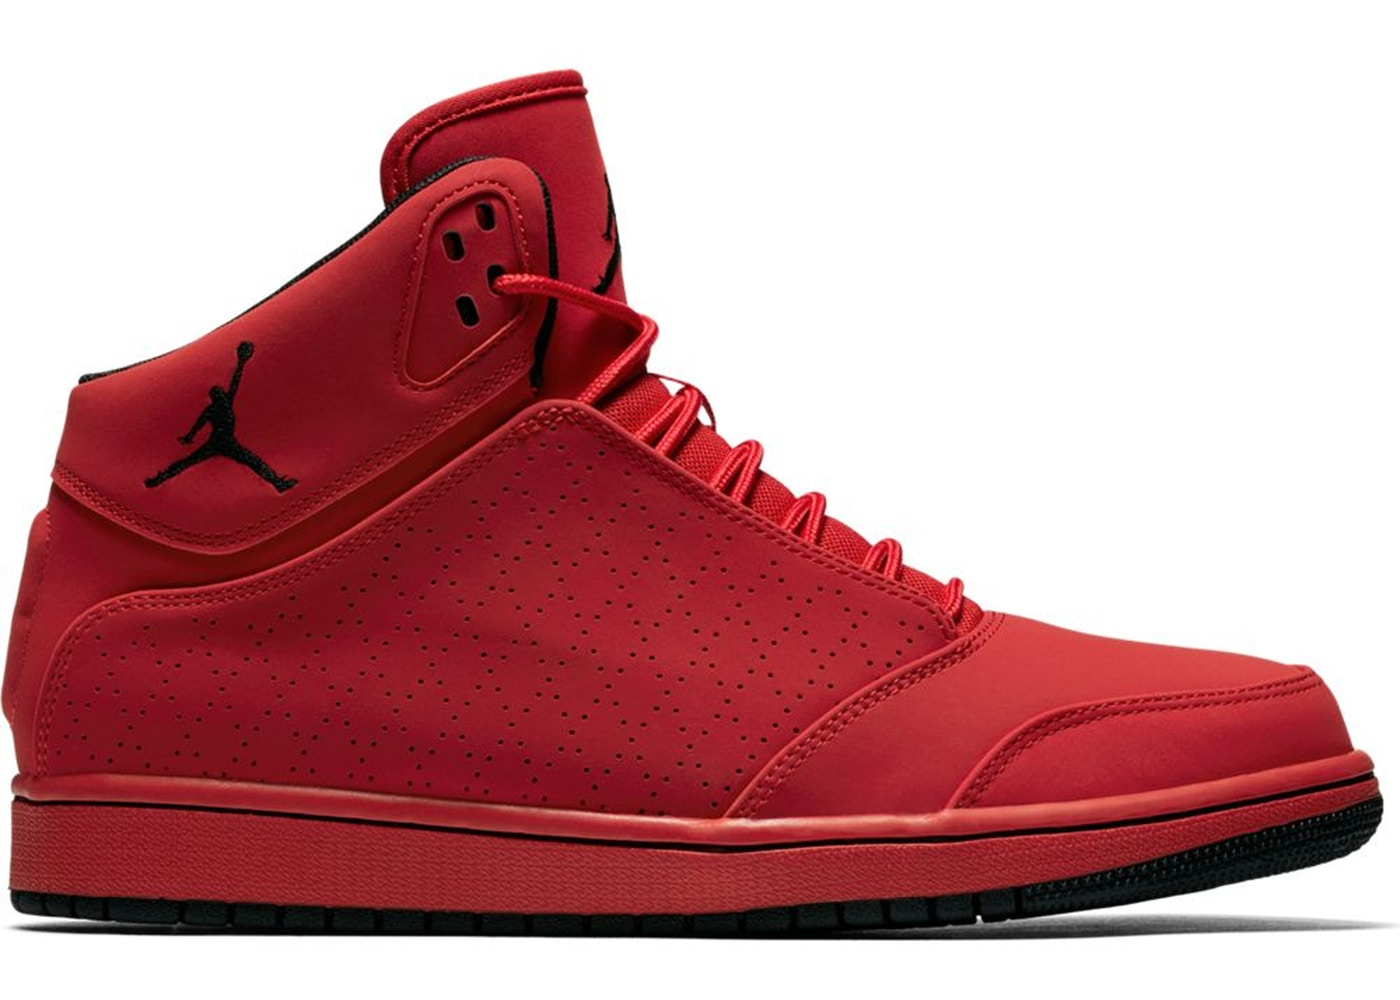 Jordan 1 Flight 5 Gym Red Black - 881433-602